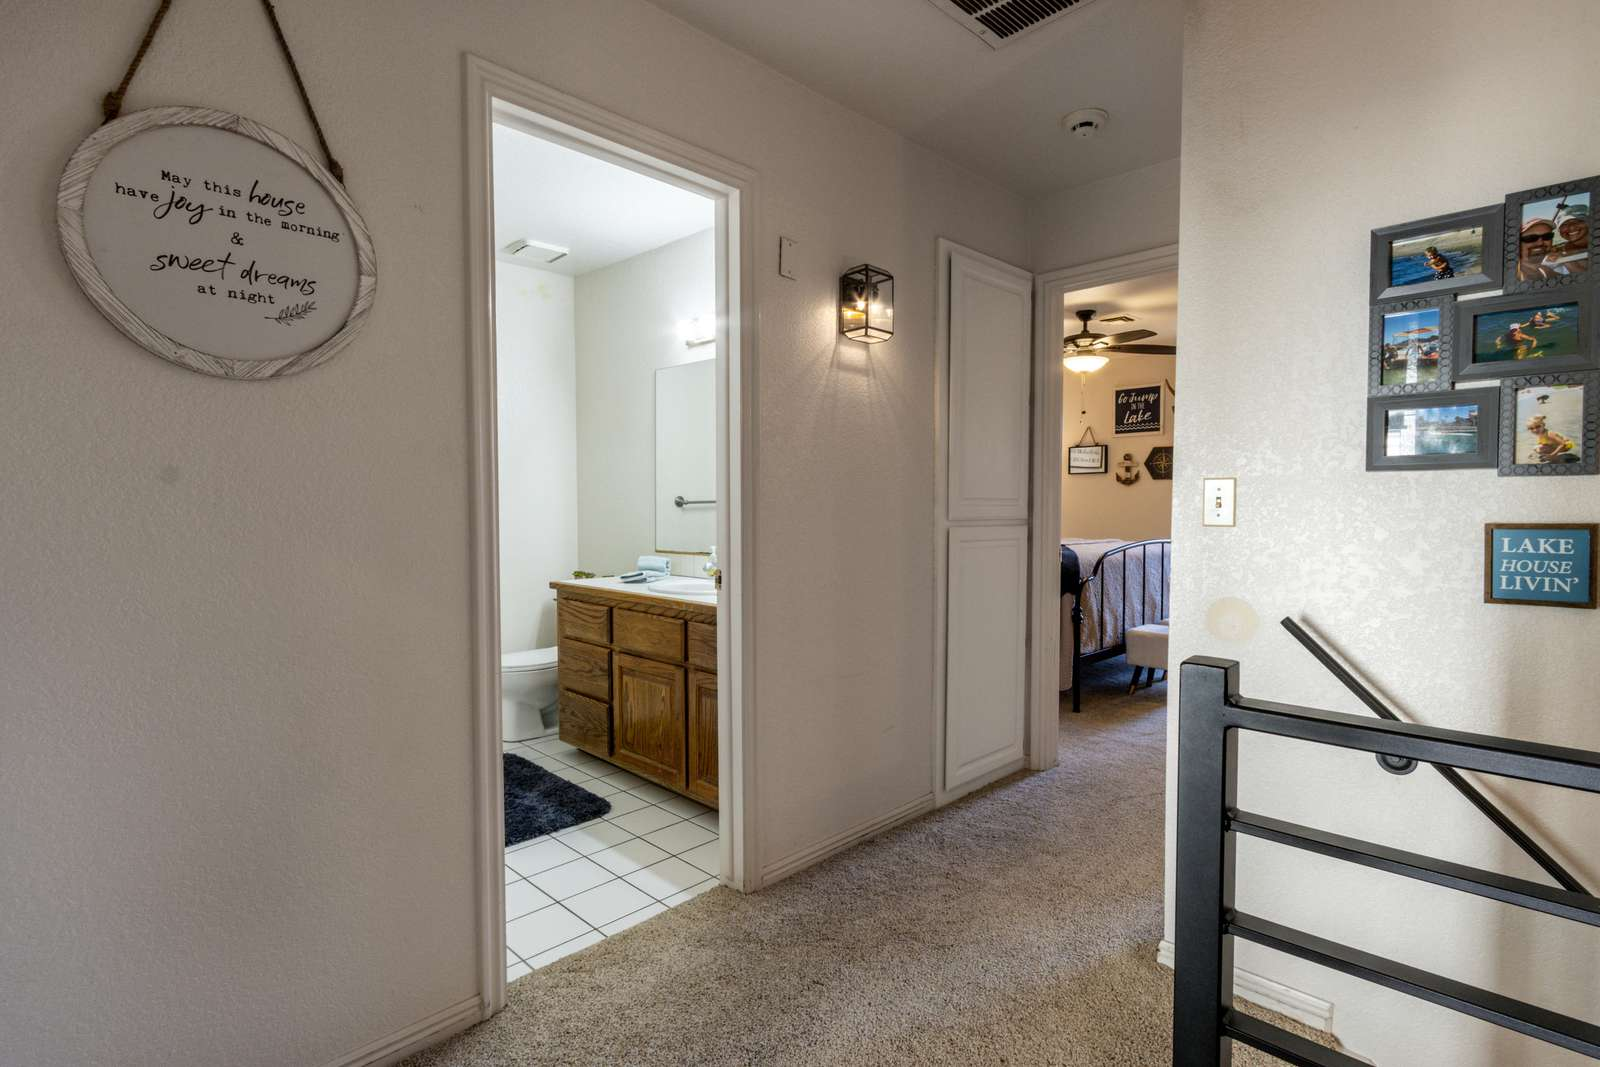 Hallway to upstairs Bathroom